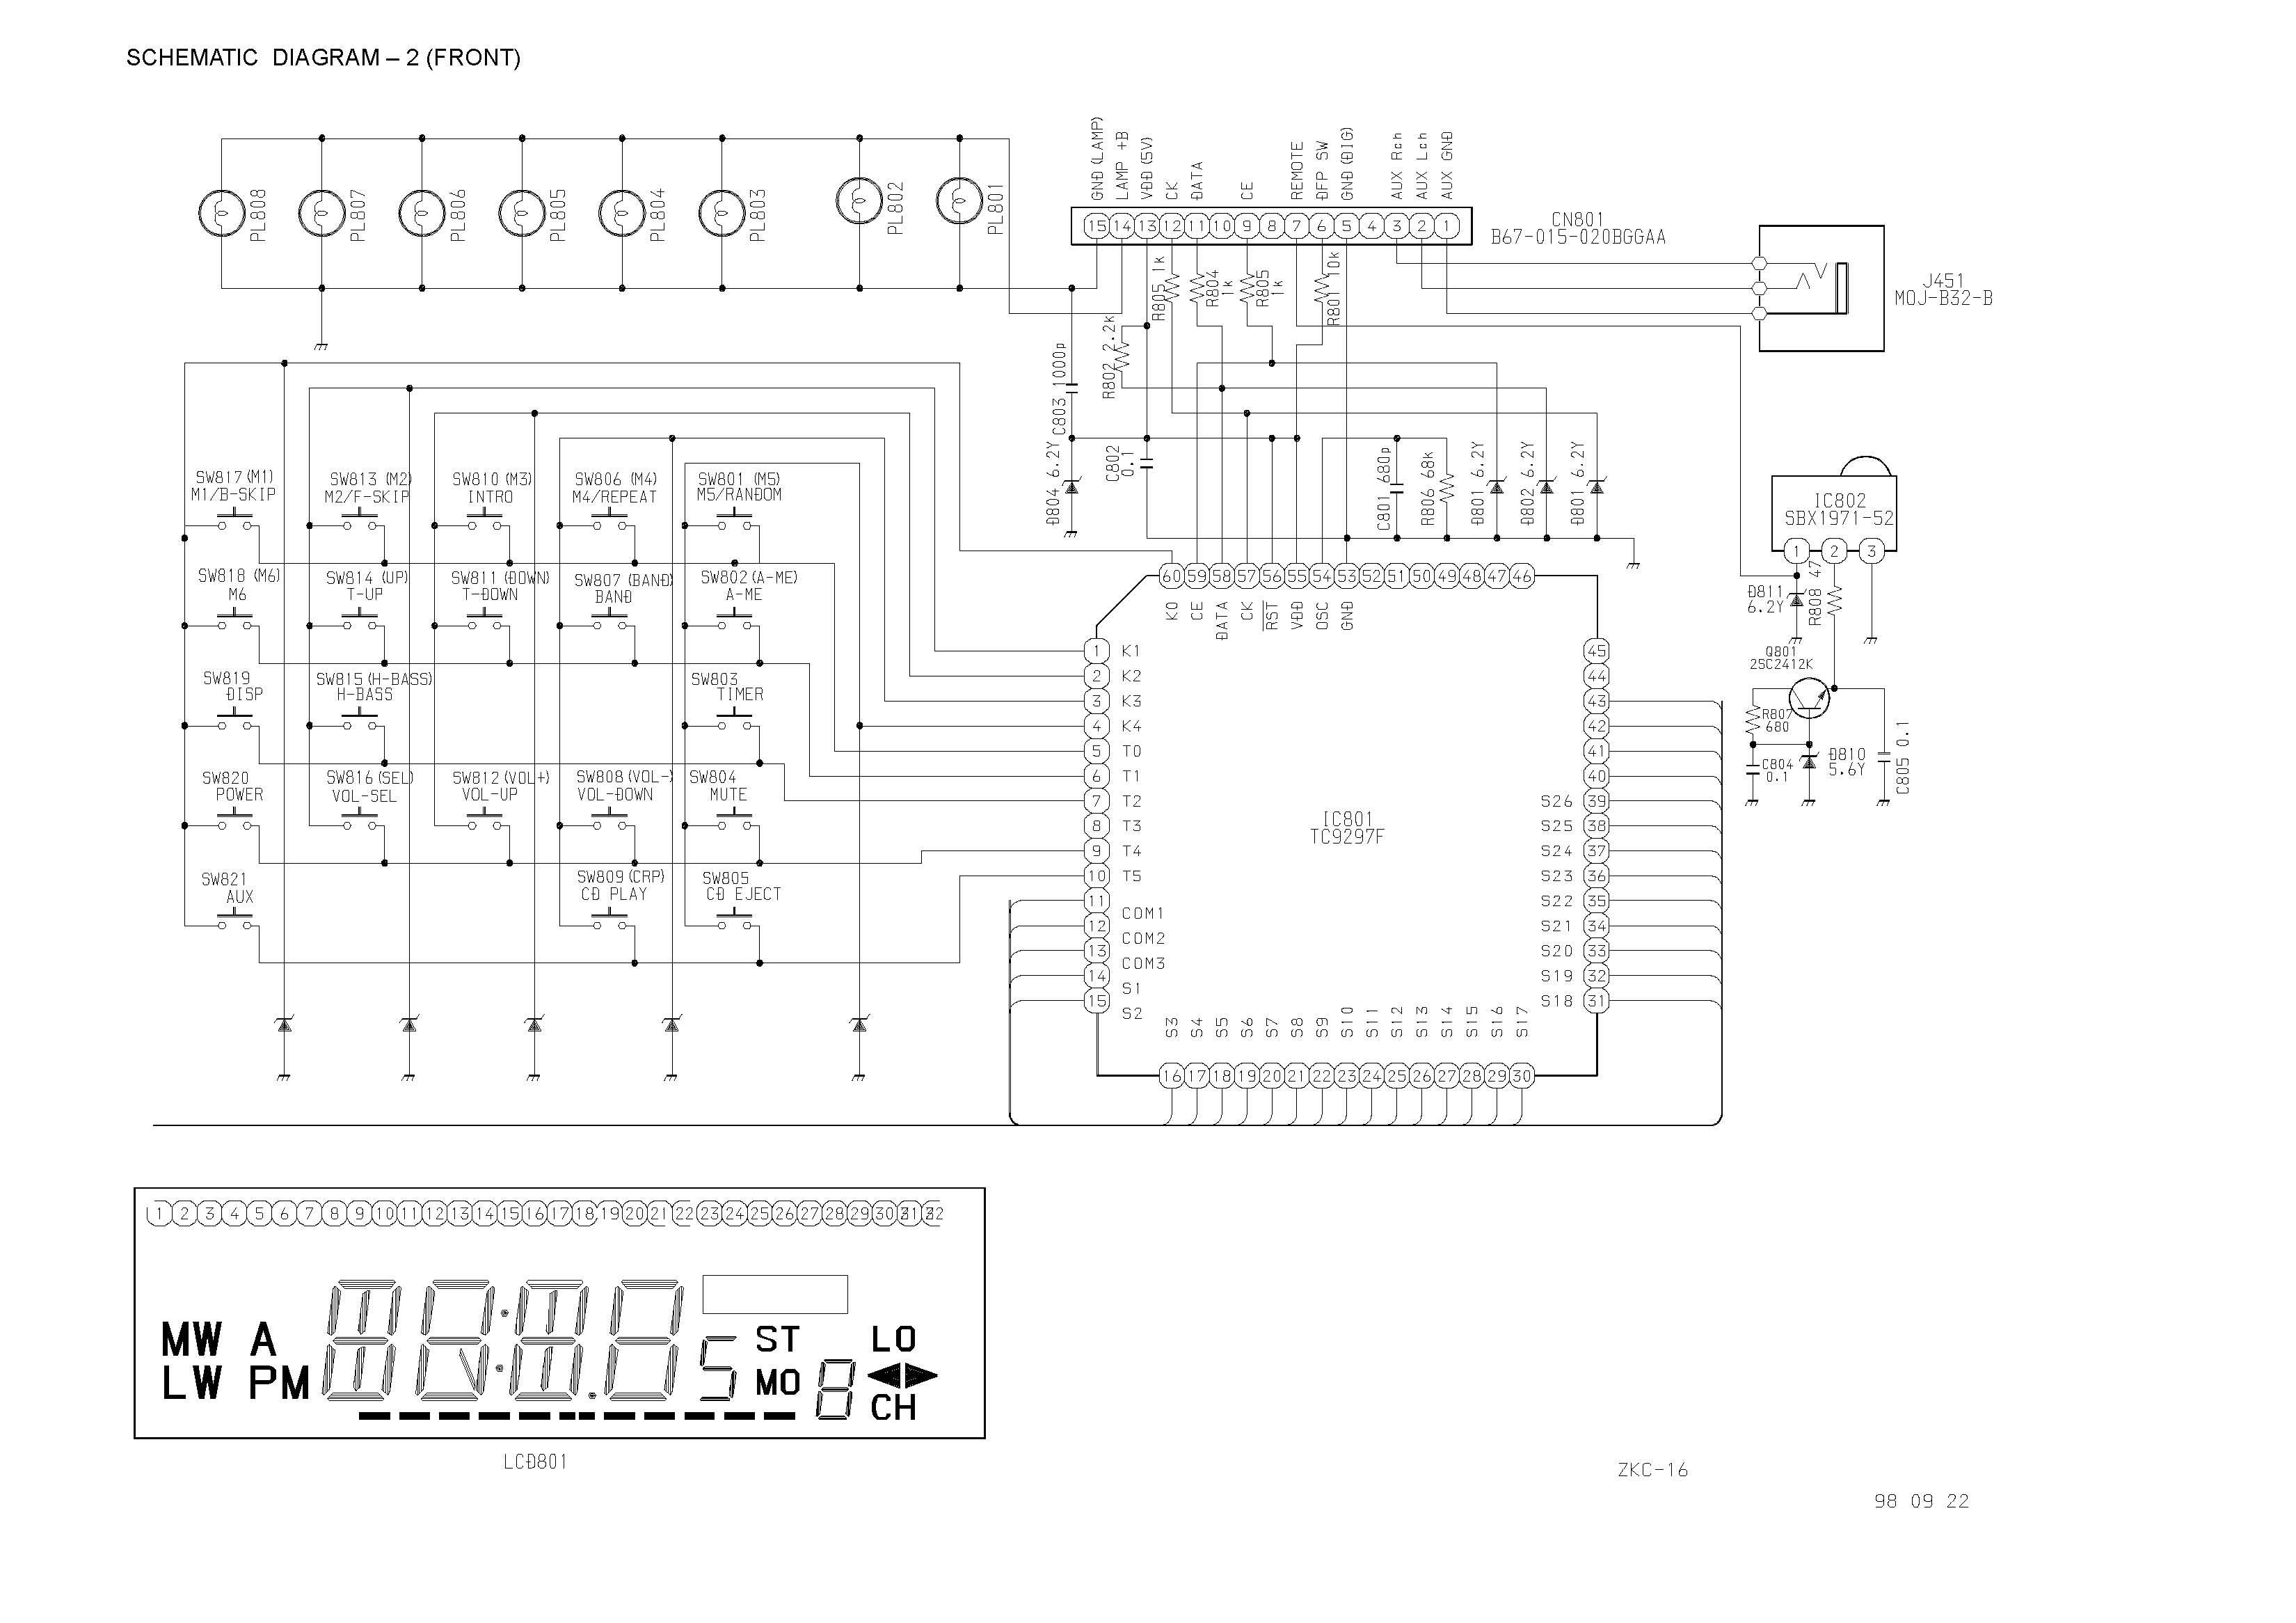 Aiwa Cdc-x1400 Schematic Diagram Main    Front In Pdf Format